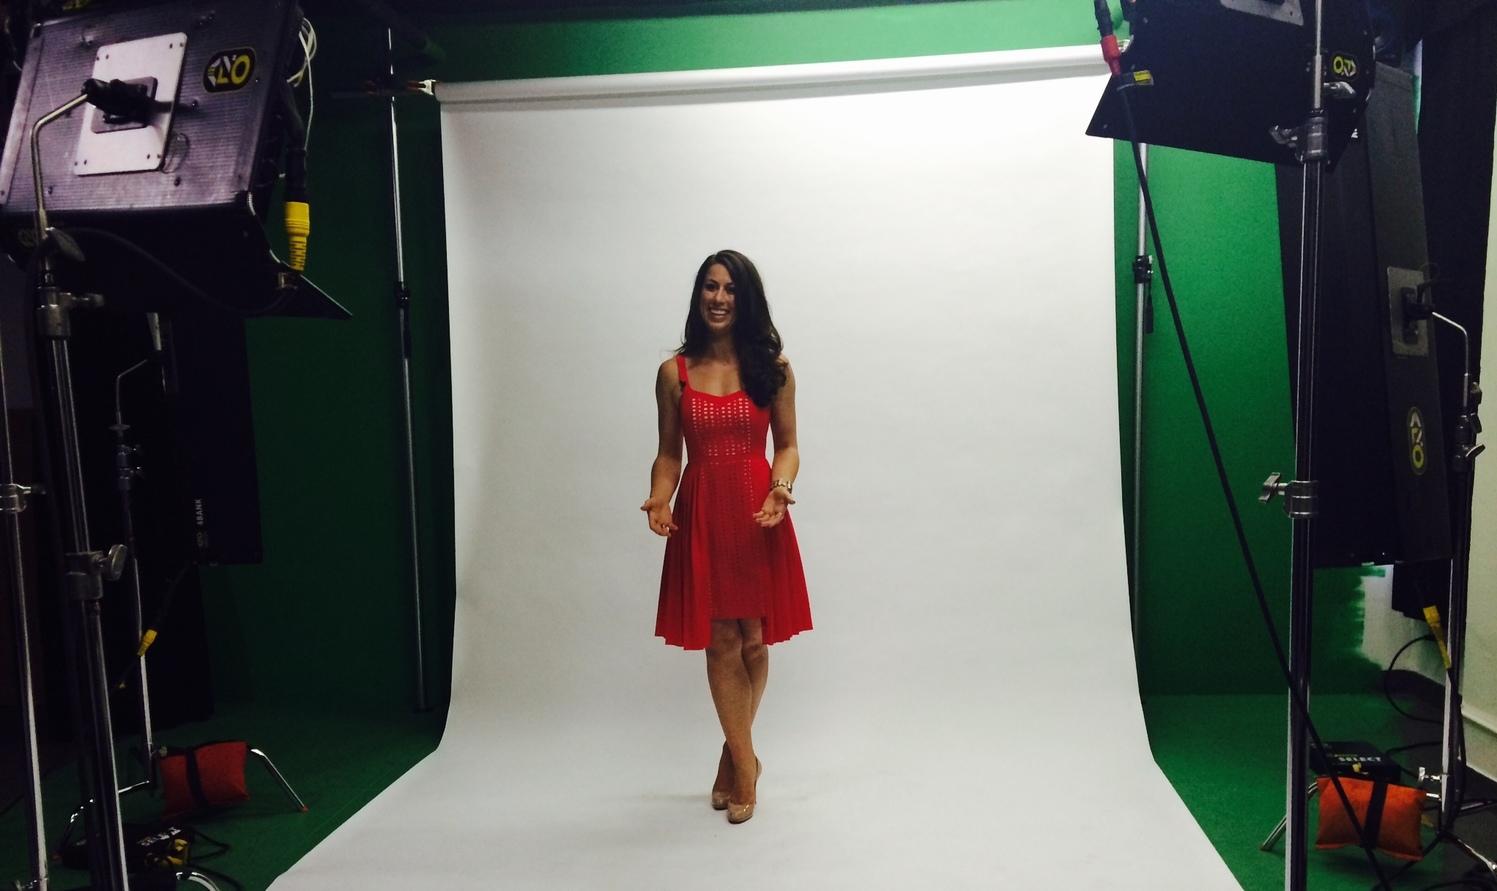 JennyBlake_Entheos_Filming.jpg